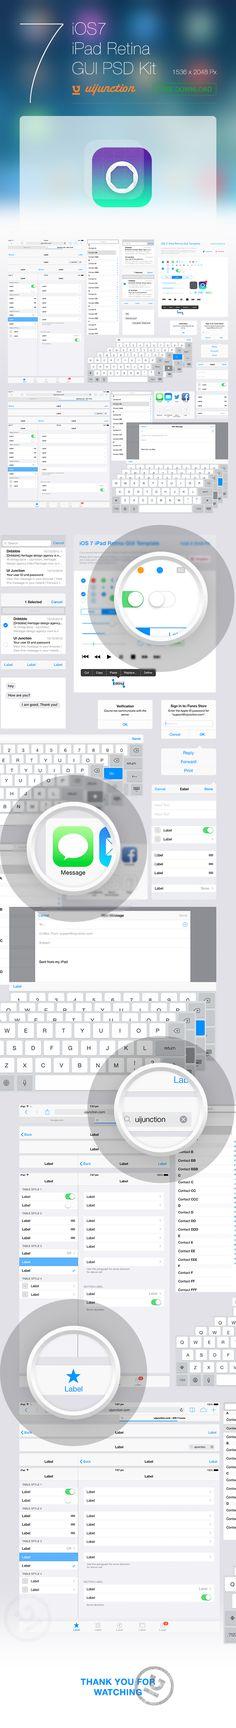 iOS 7 iPad Retina GUI PSD Kit by Chirag , via Behance